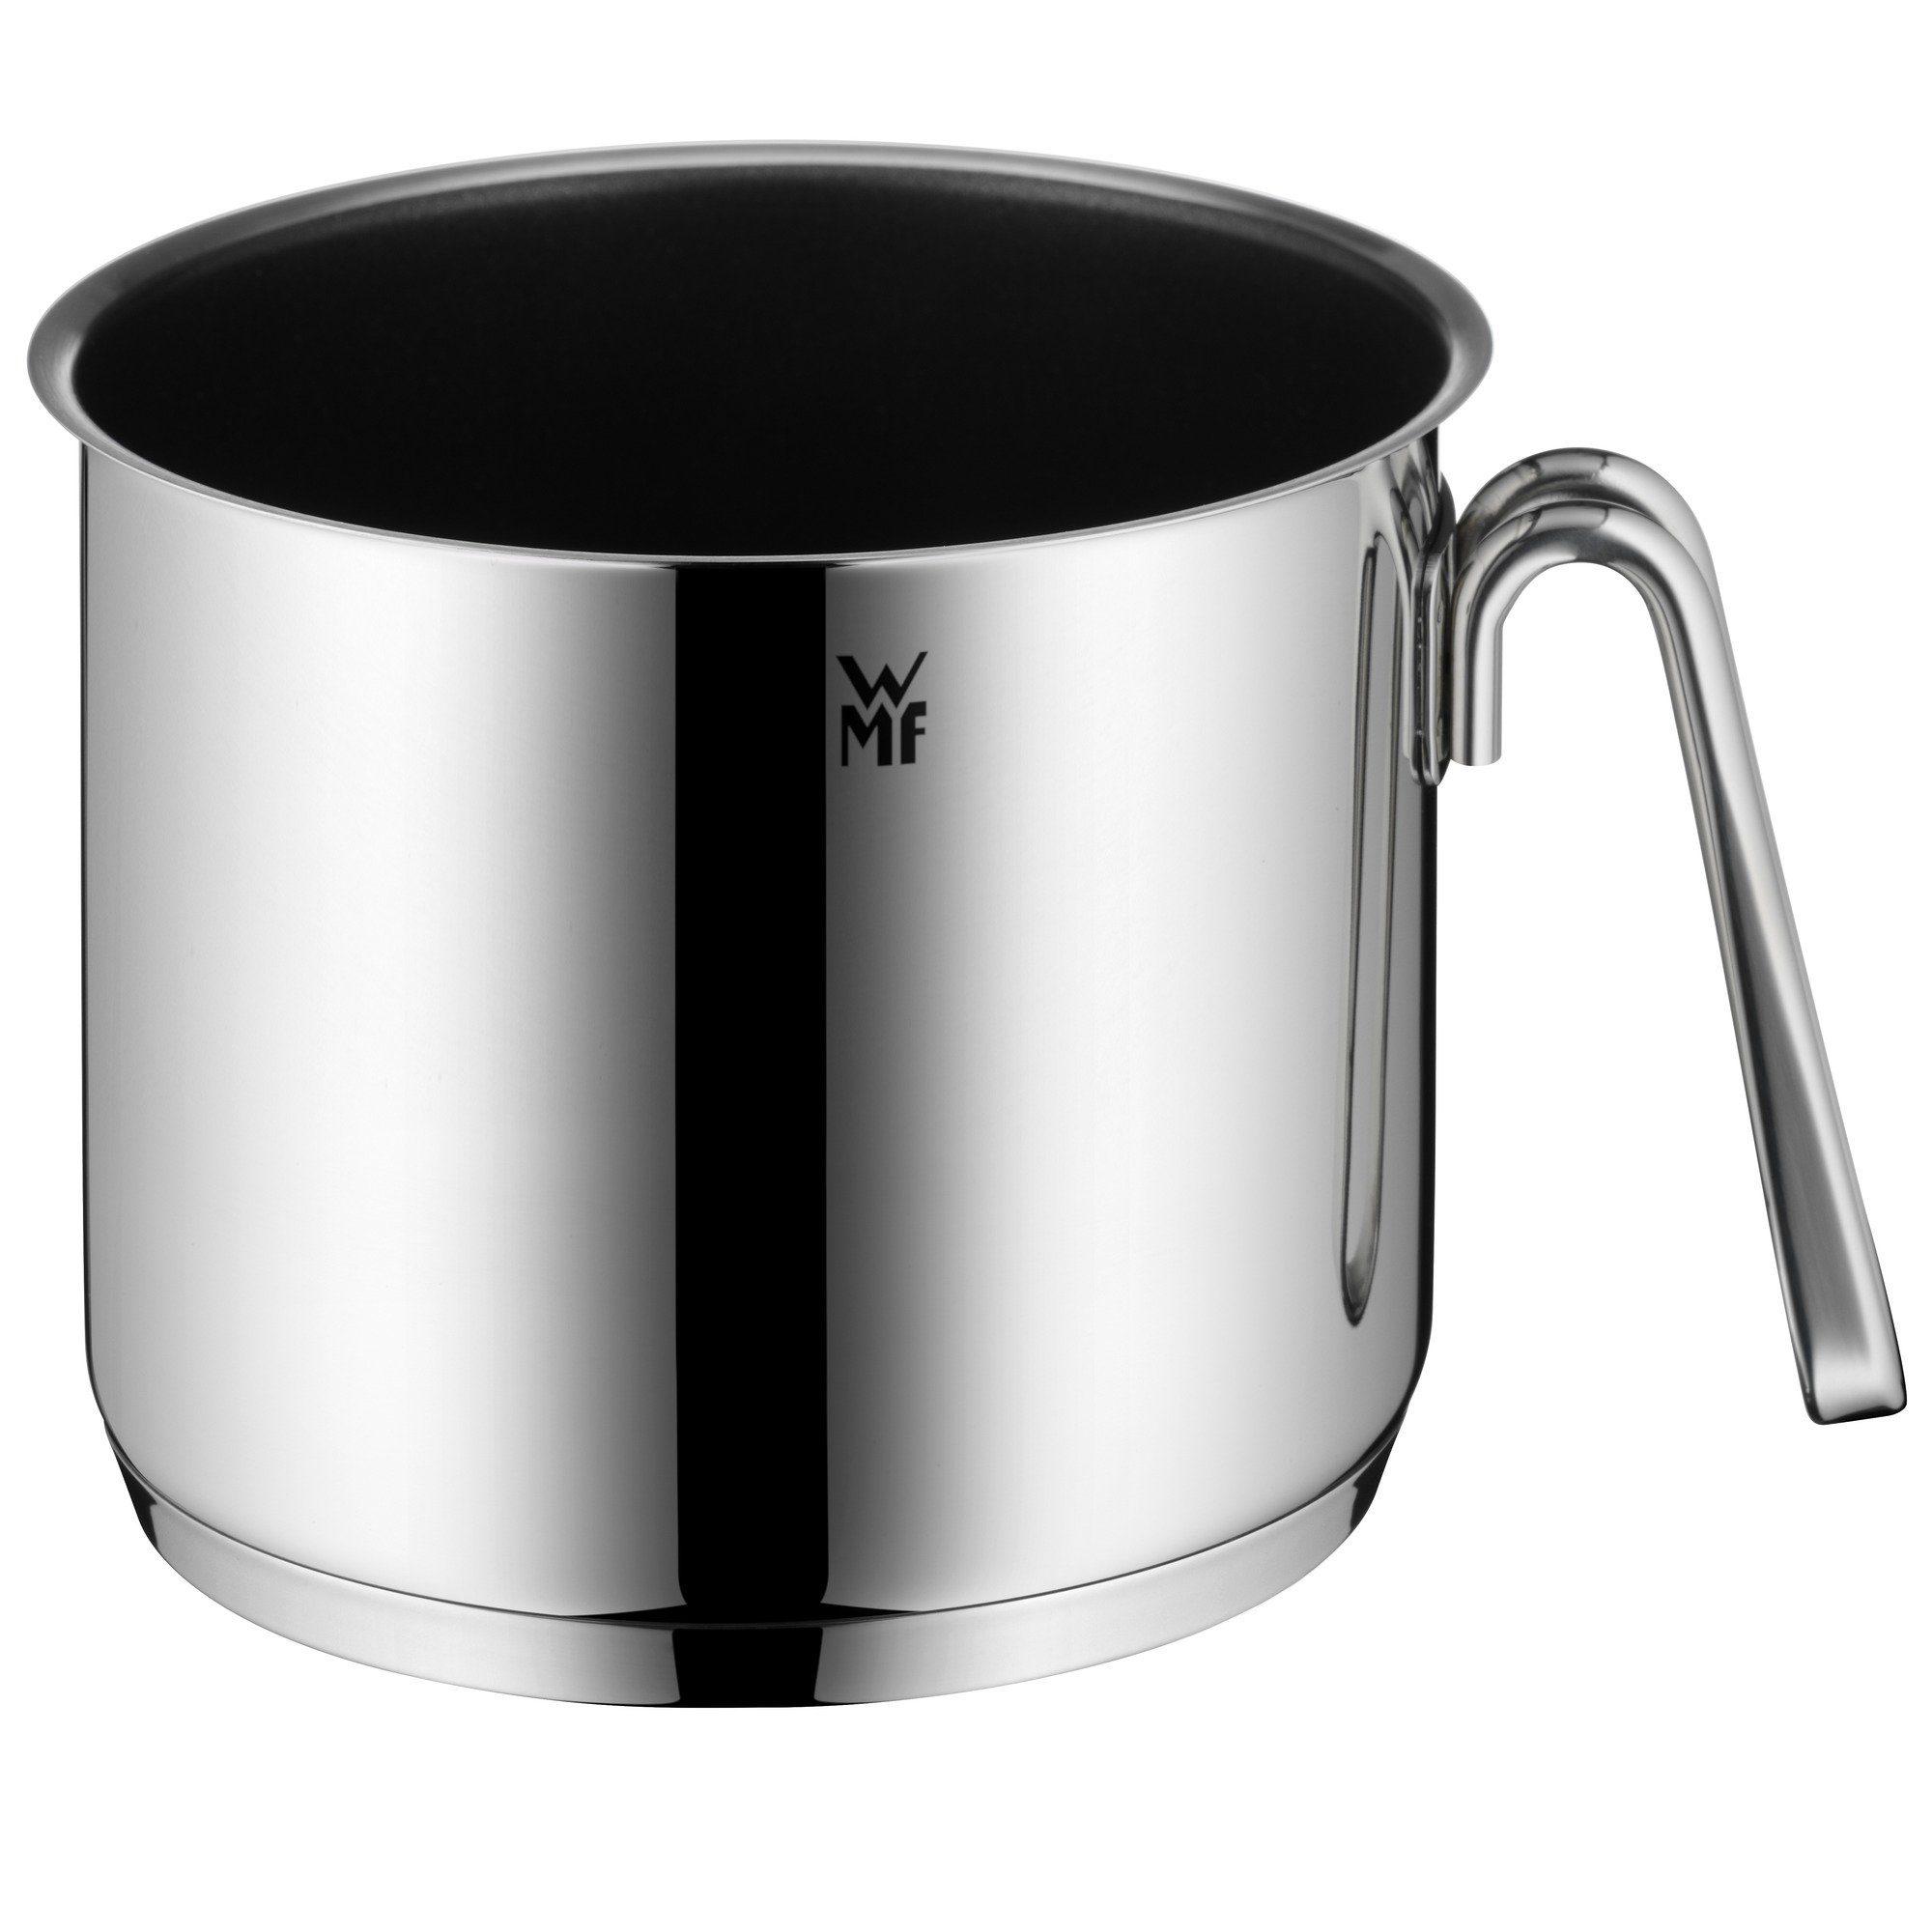 WMF Milchtopf, Ø 14 cm »Vignola«